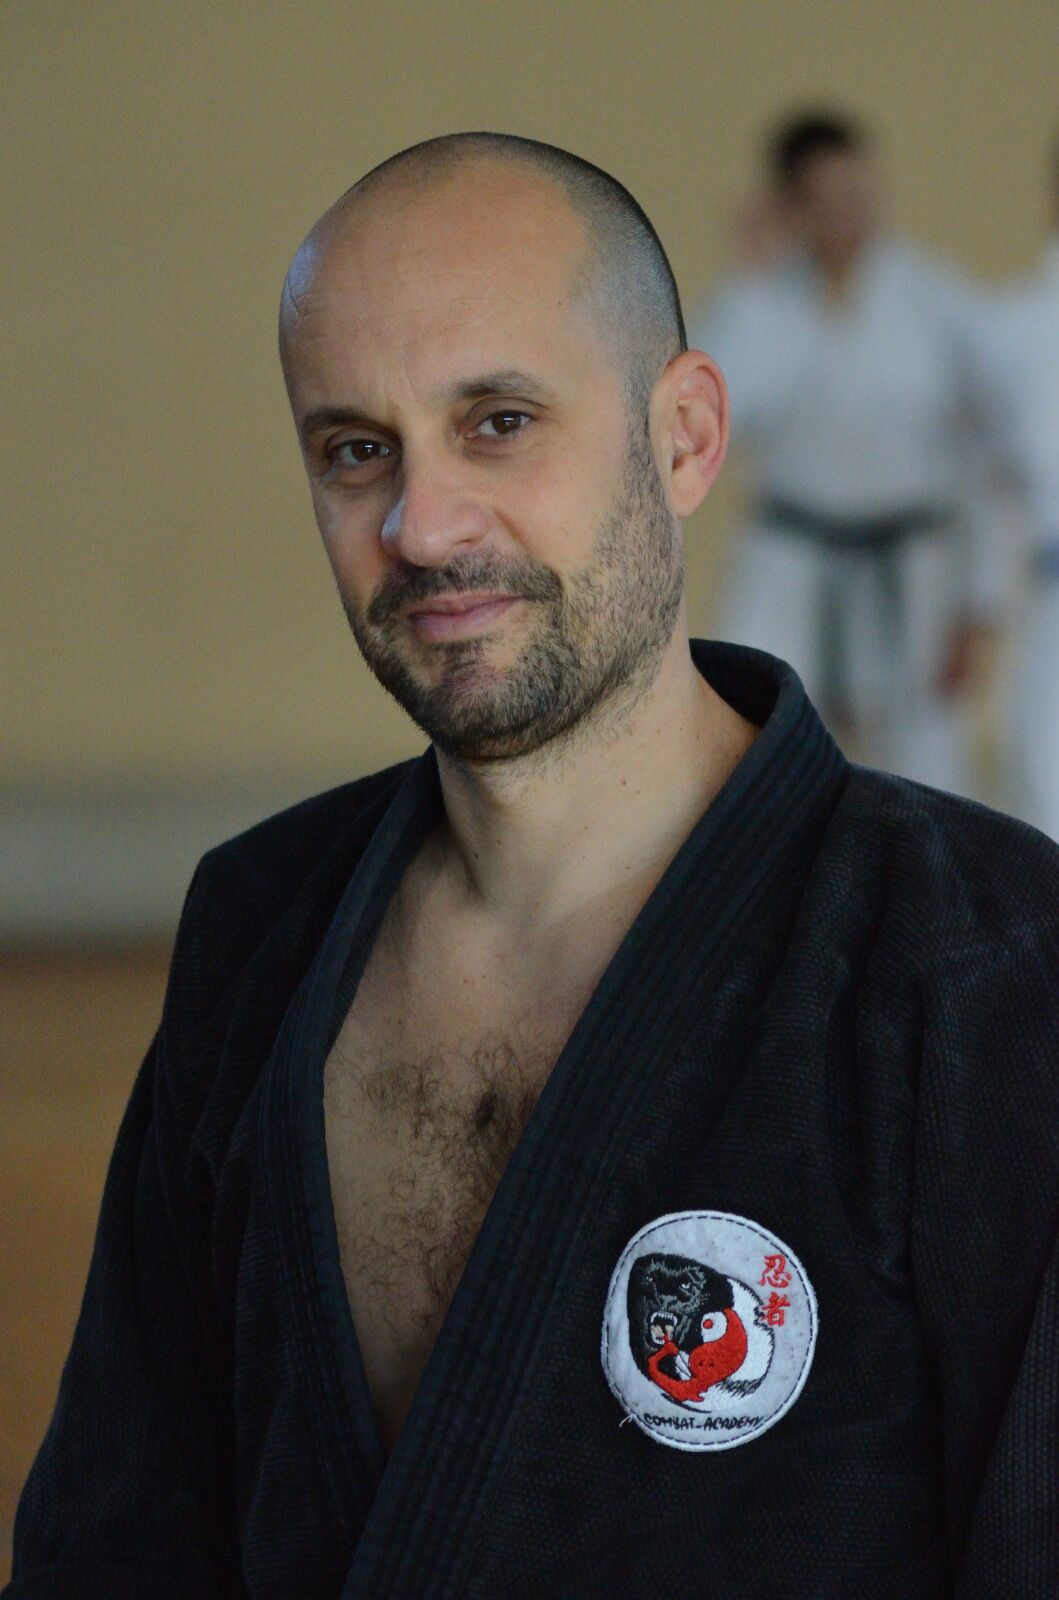 Roberto Salvato